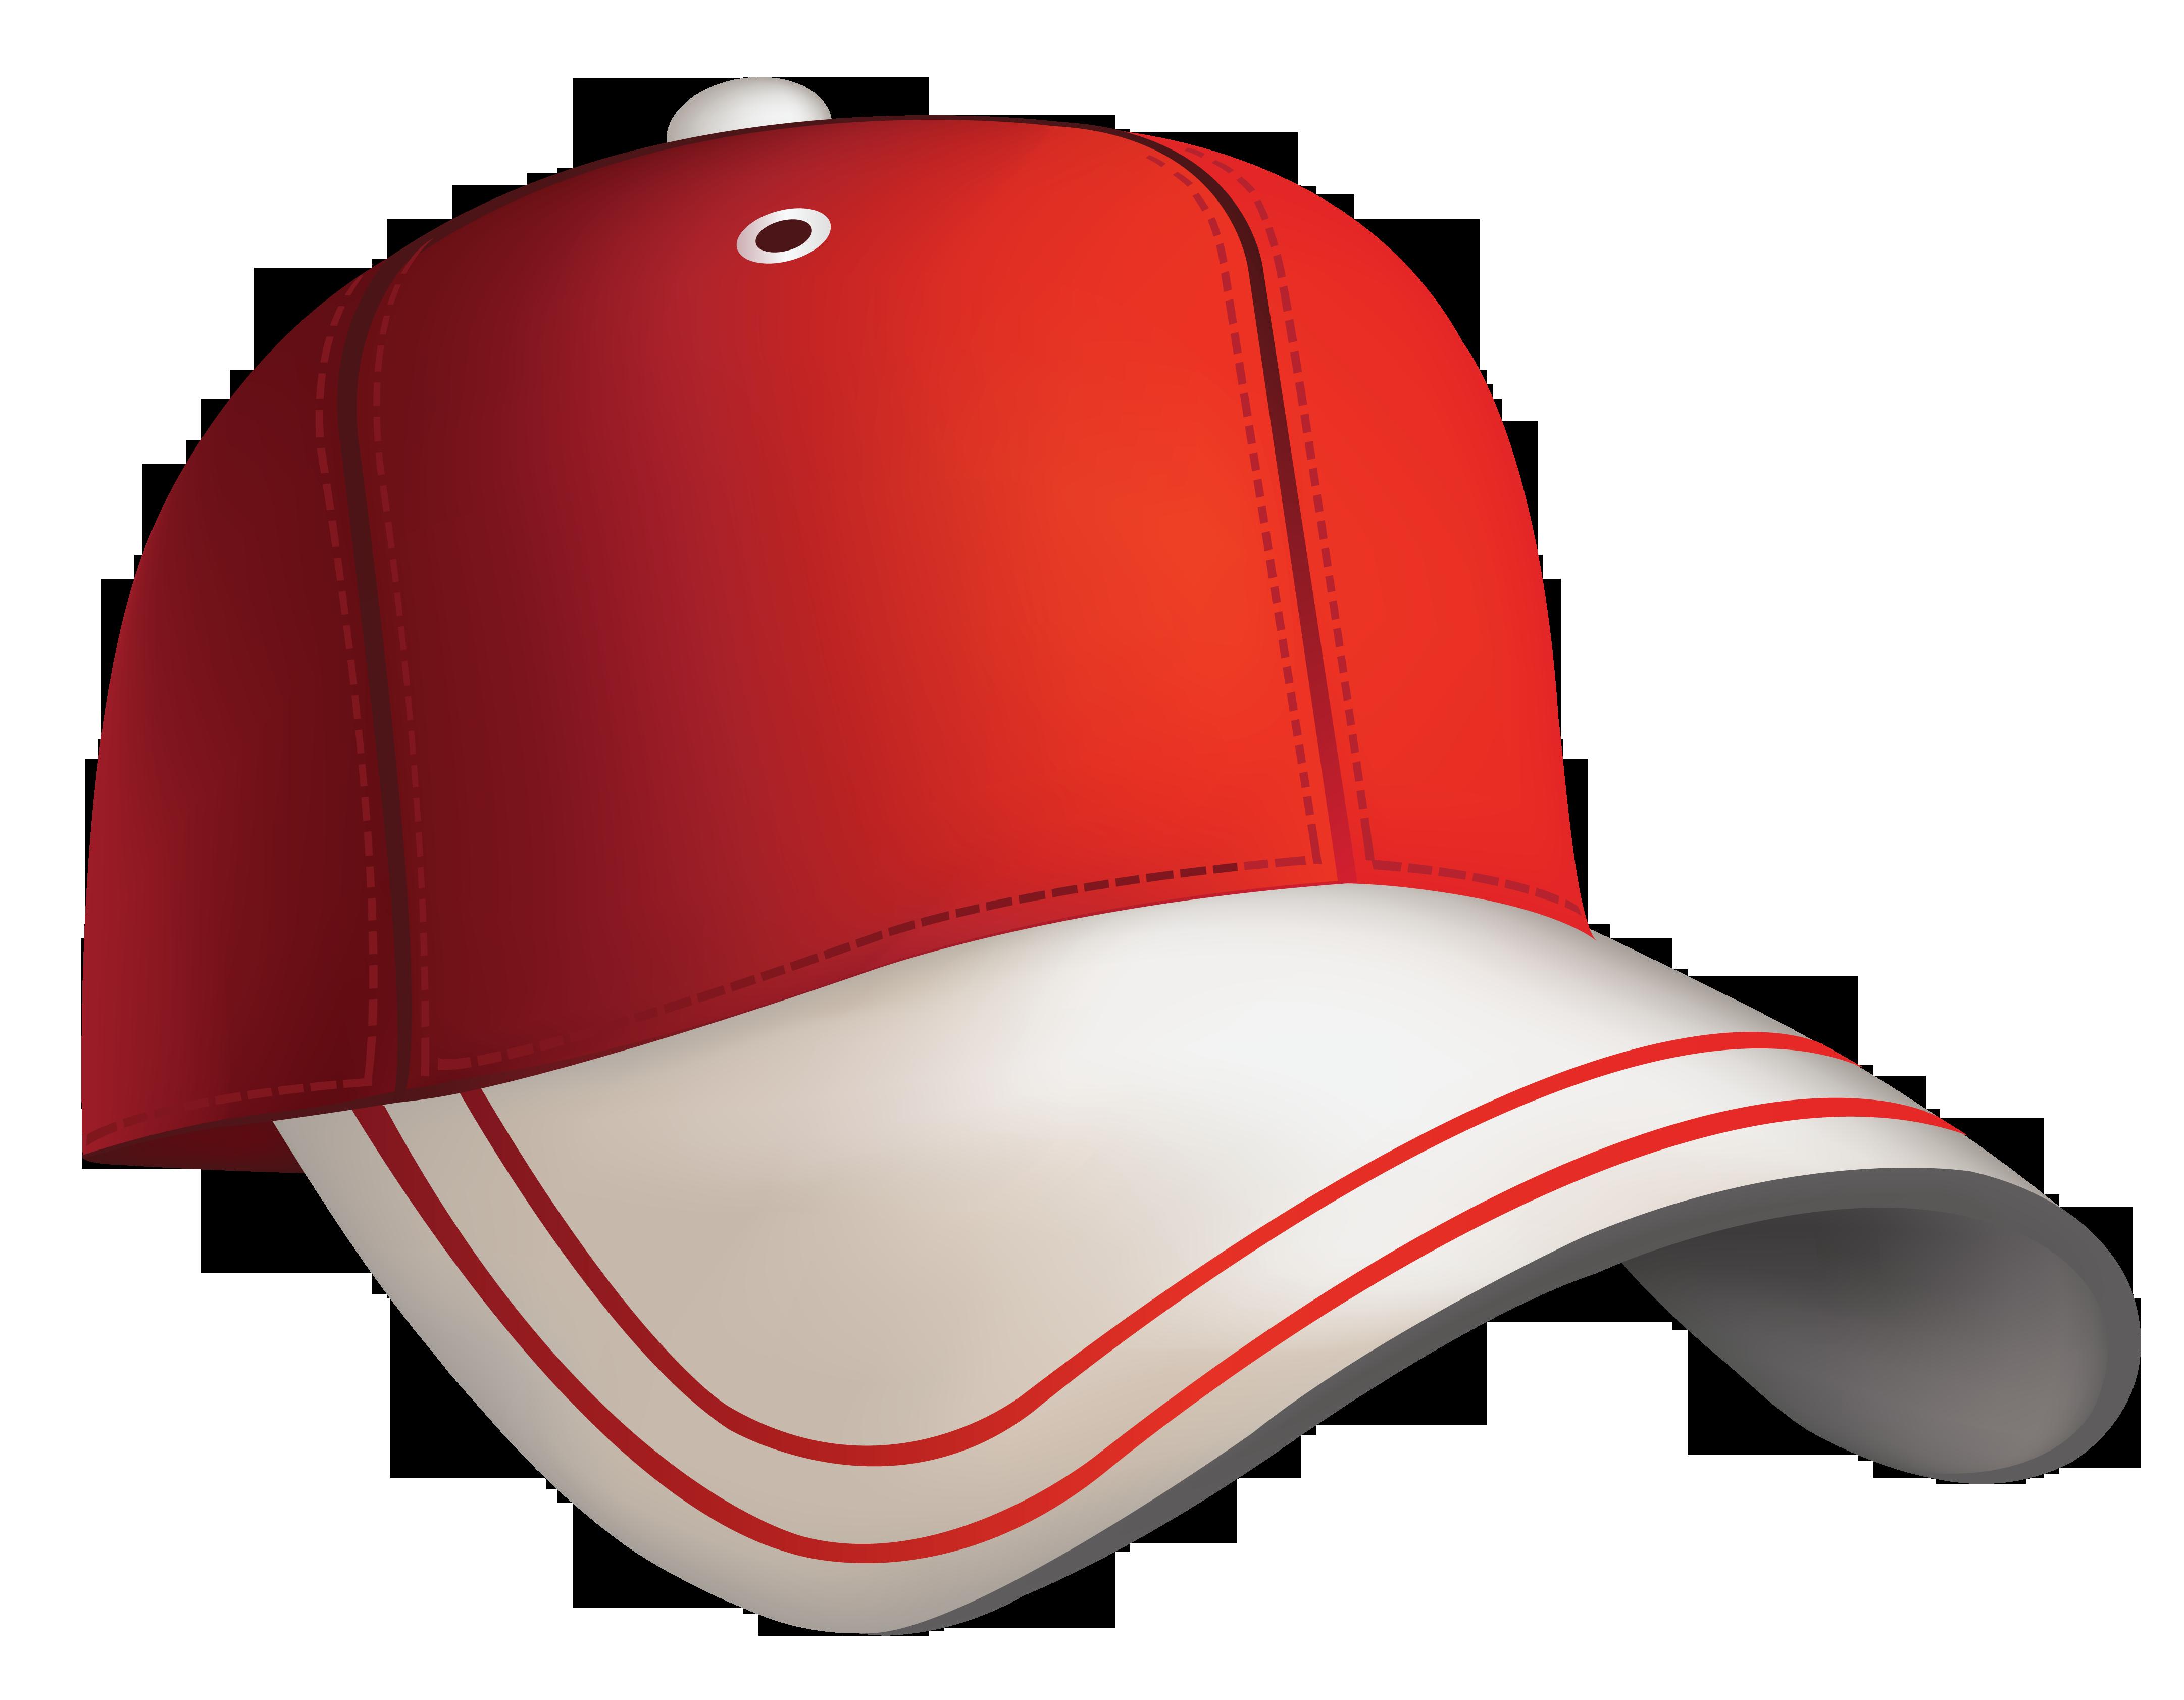 4325x3366 Baseball Hat Clip Art 4